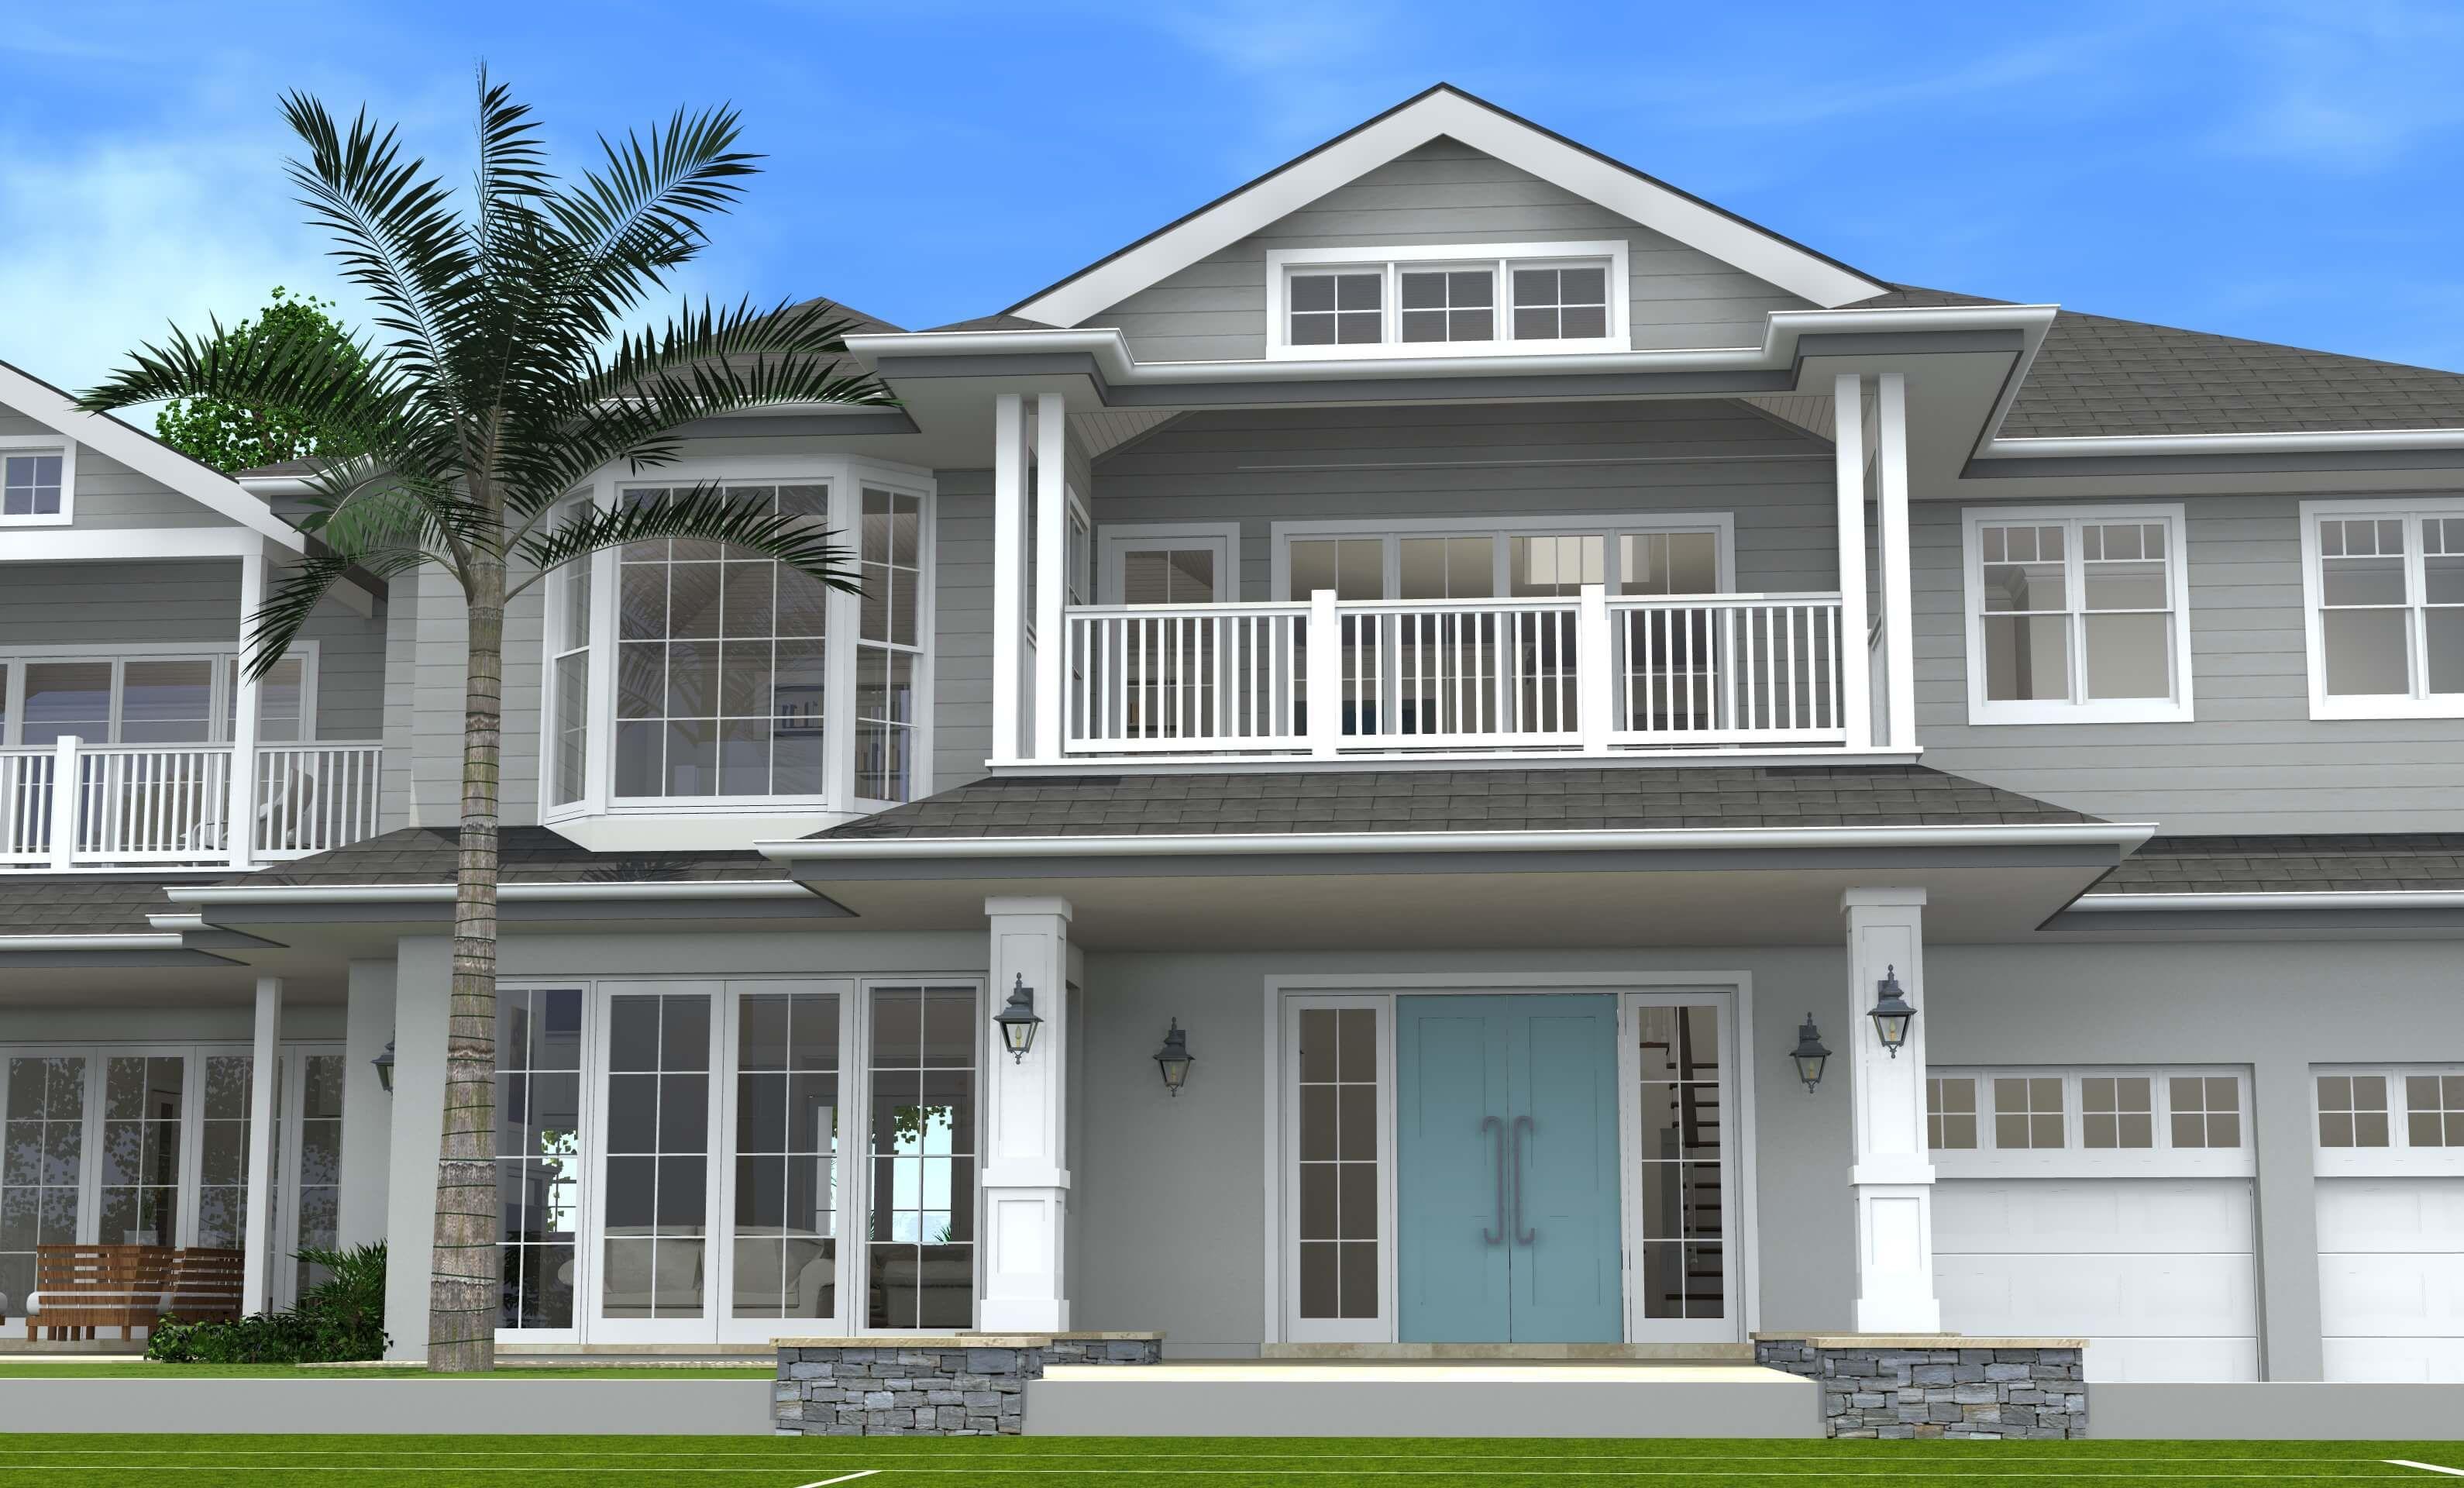 Architect Designed Home Hamptons House North Balgowlah Hamptons House Hamptons Style Homes Architect Design